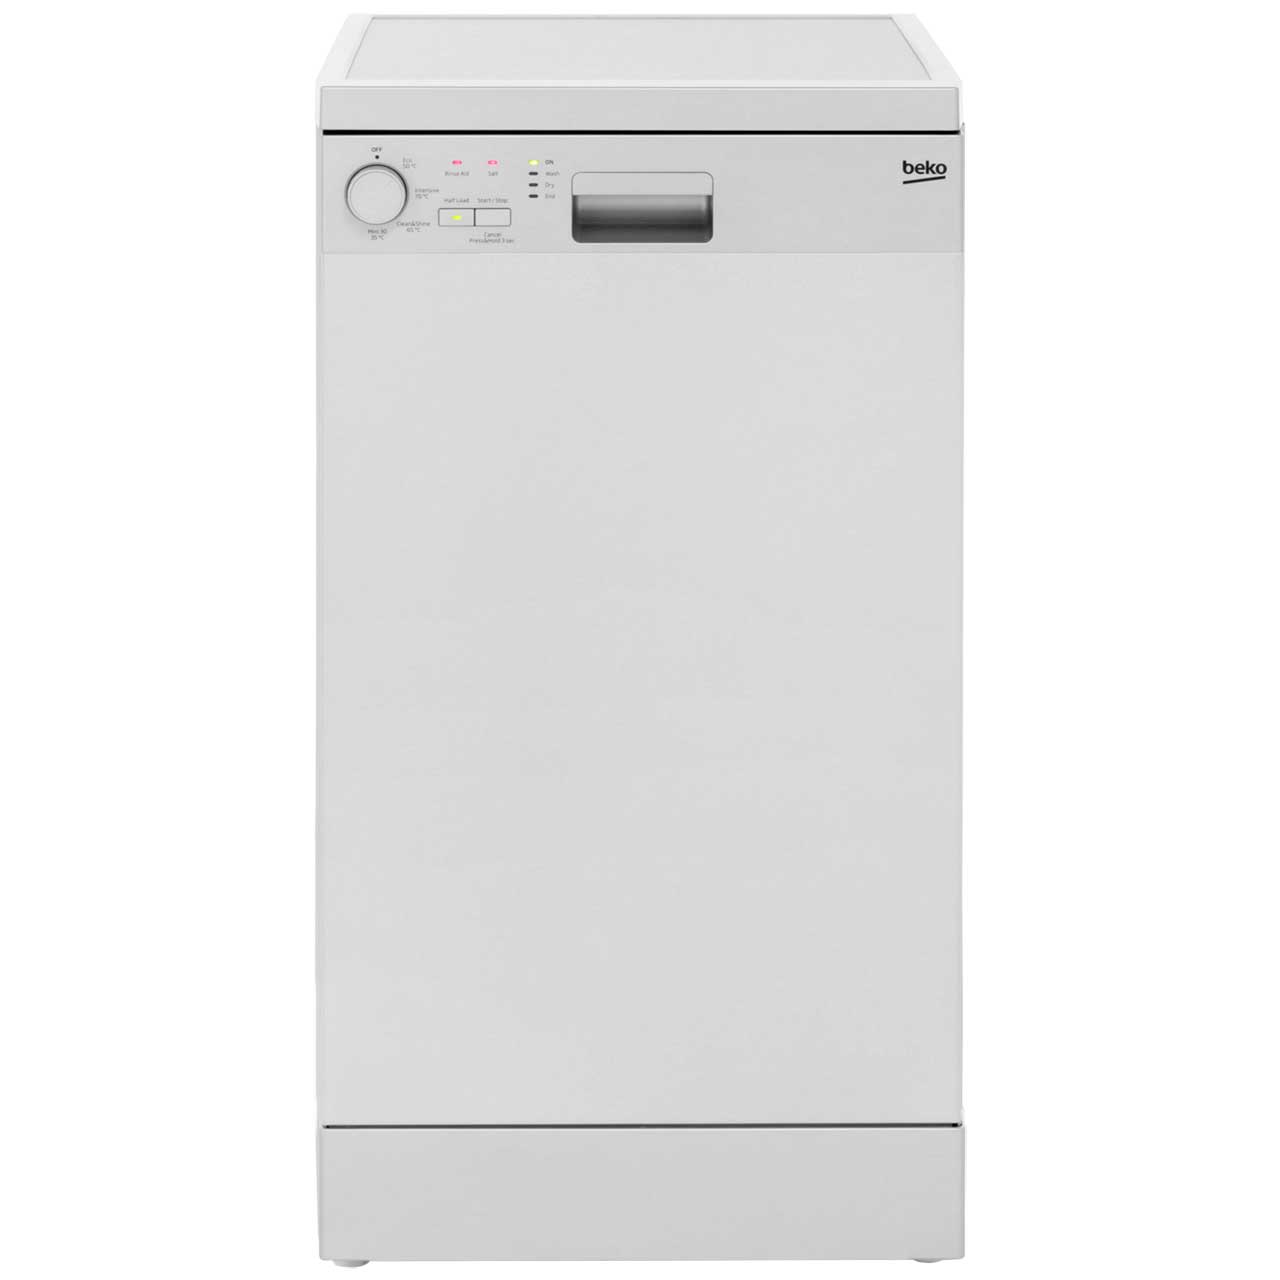 Beko DFS04R10S Free Standing Slimline Dishwasher in Silver